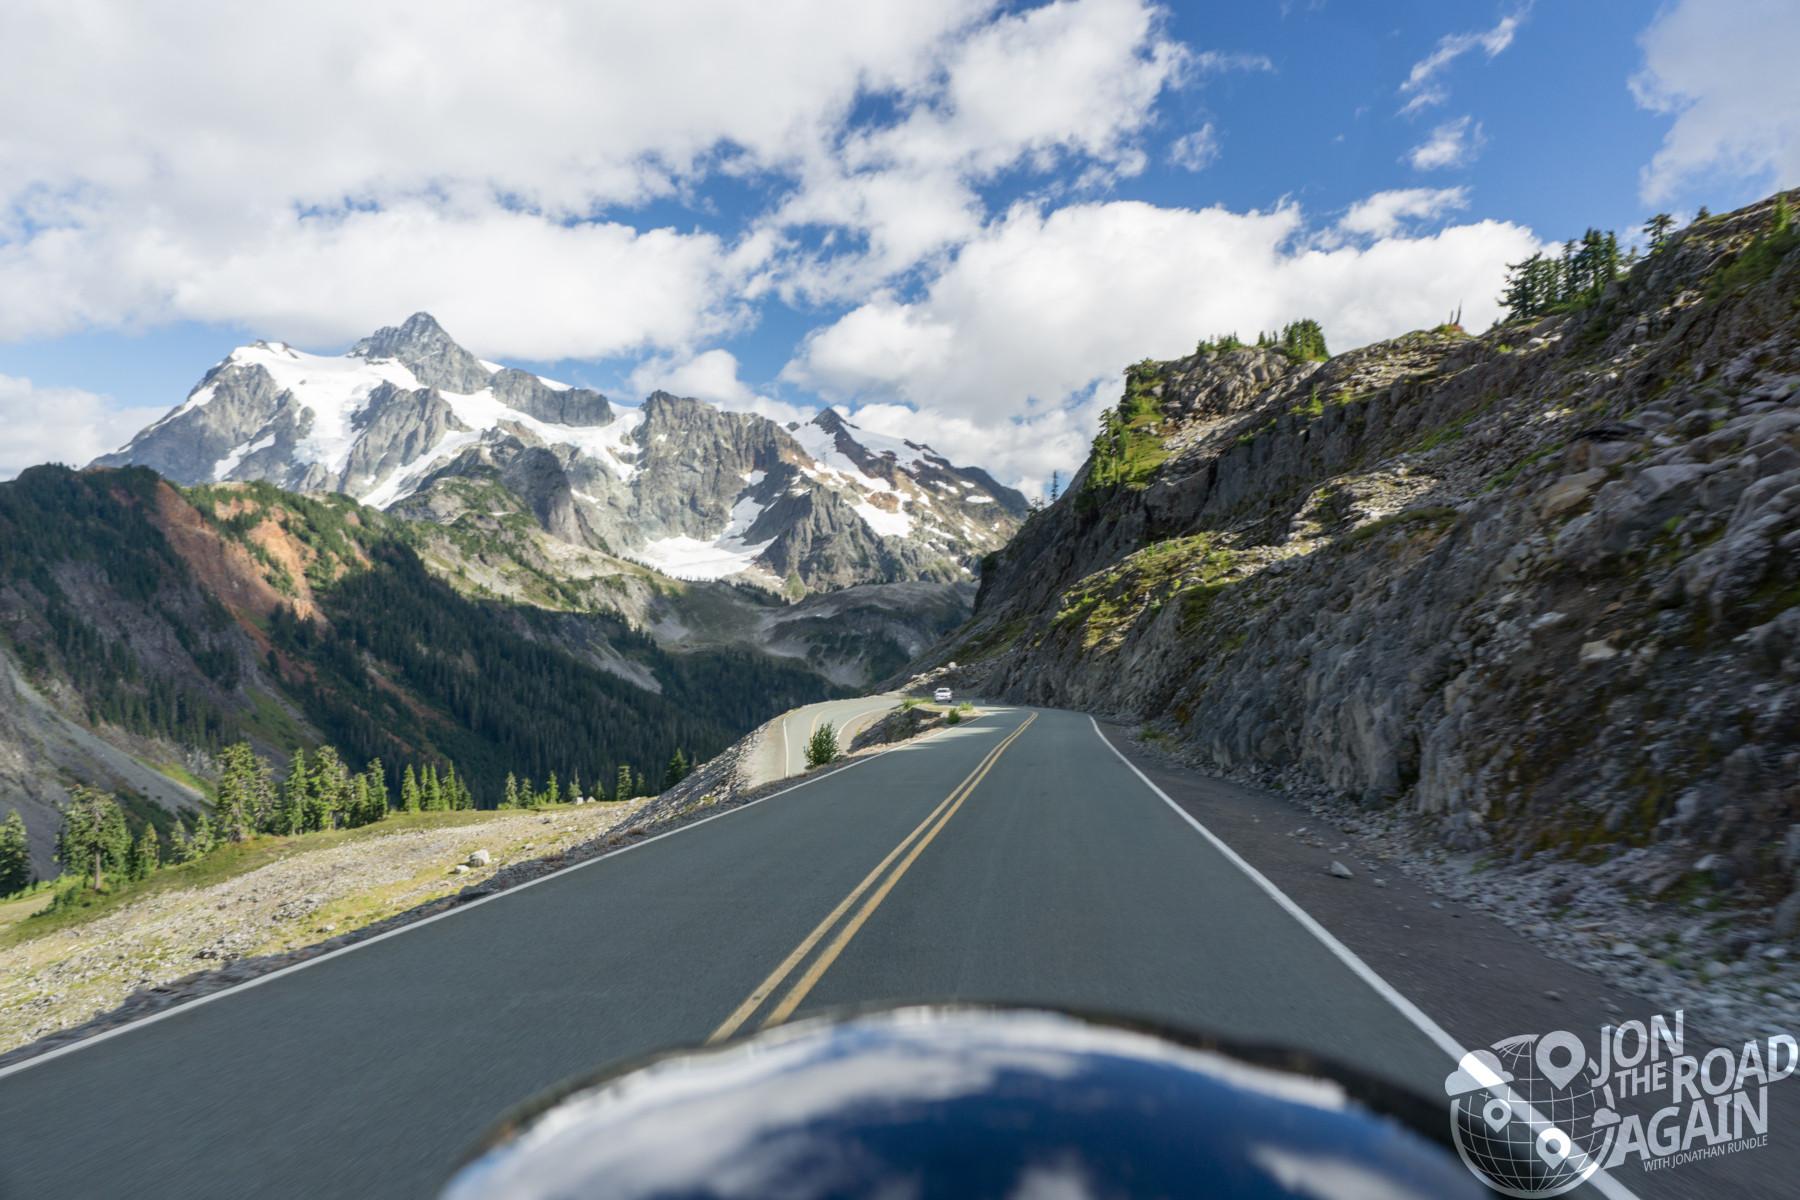 Motorcycling Artist Point / Mount Baker